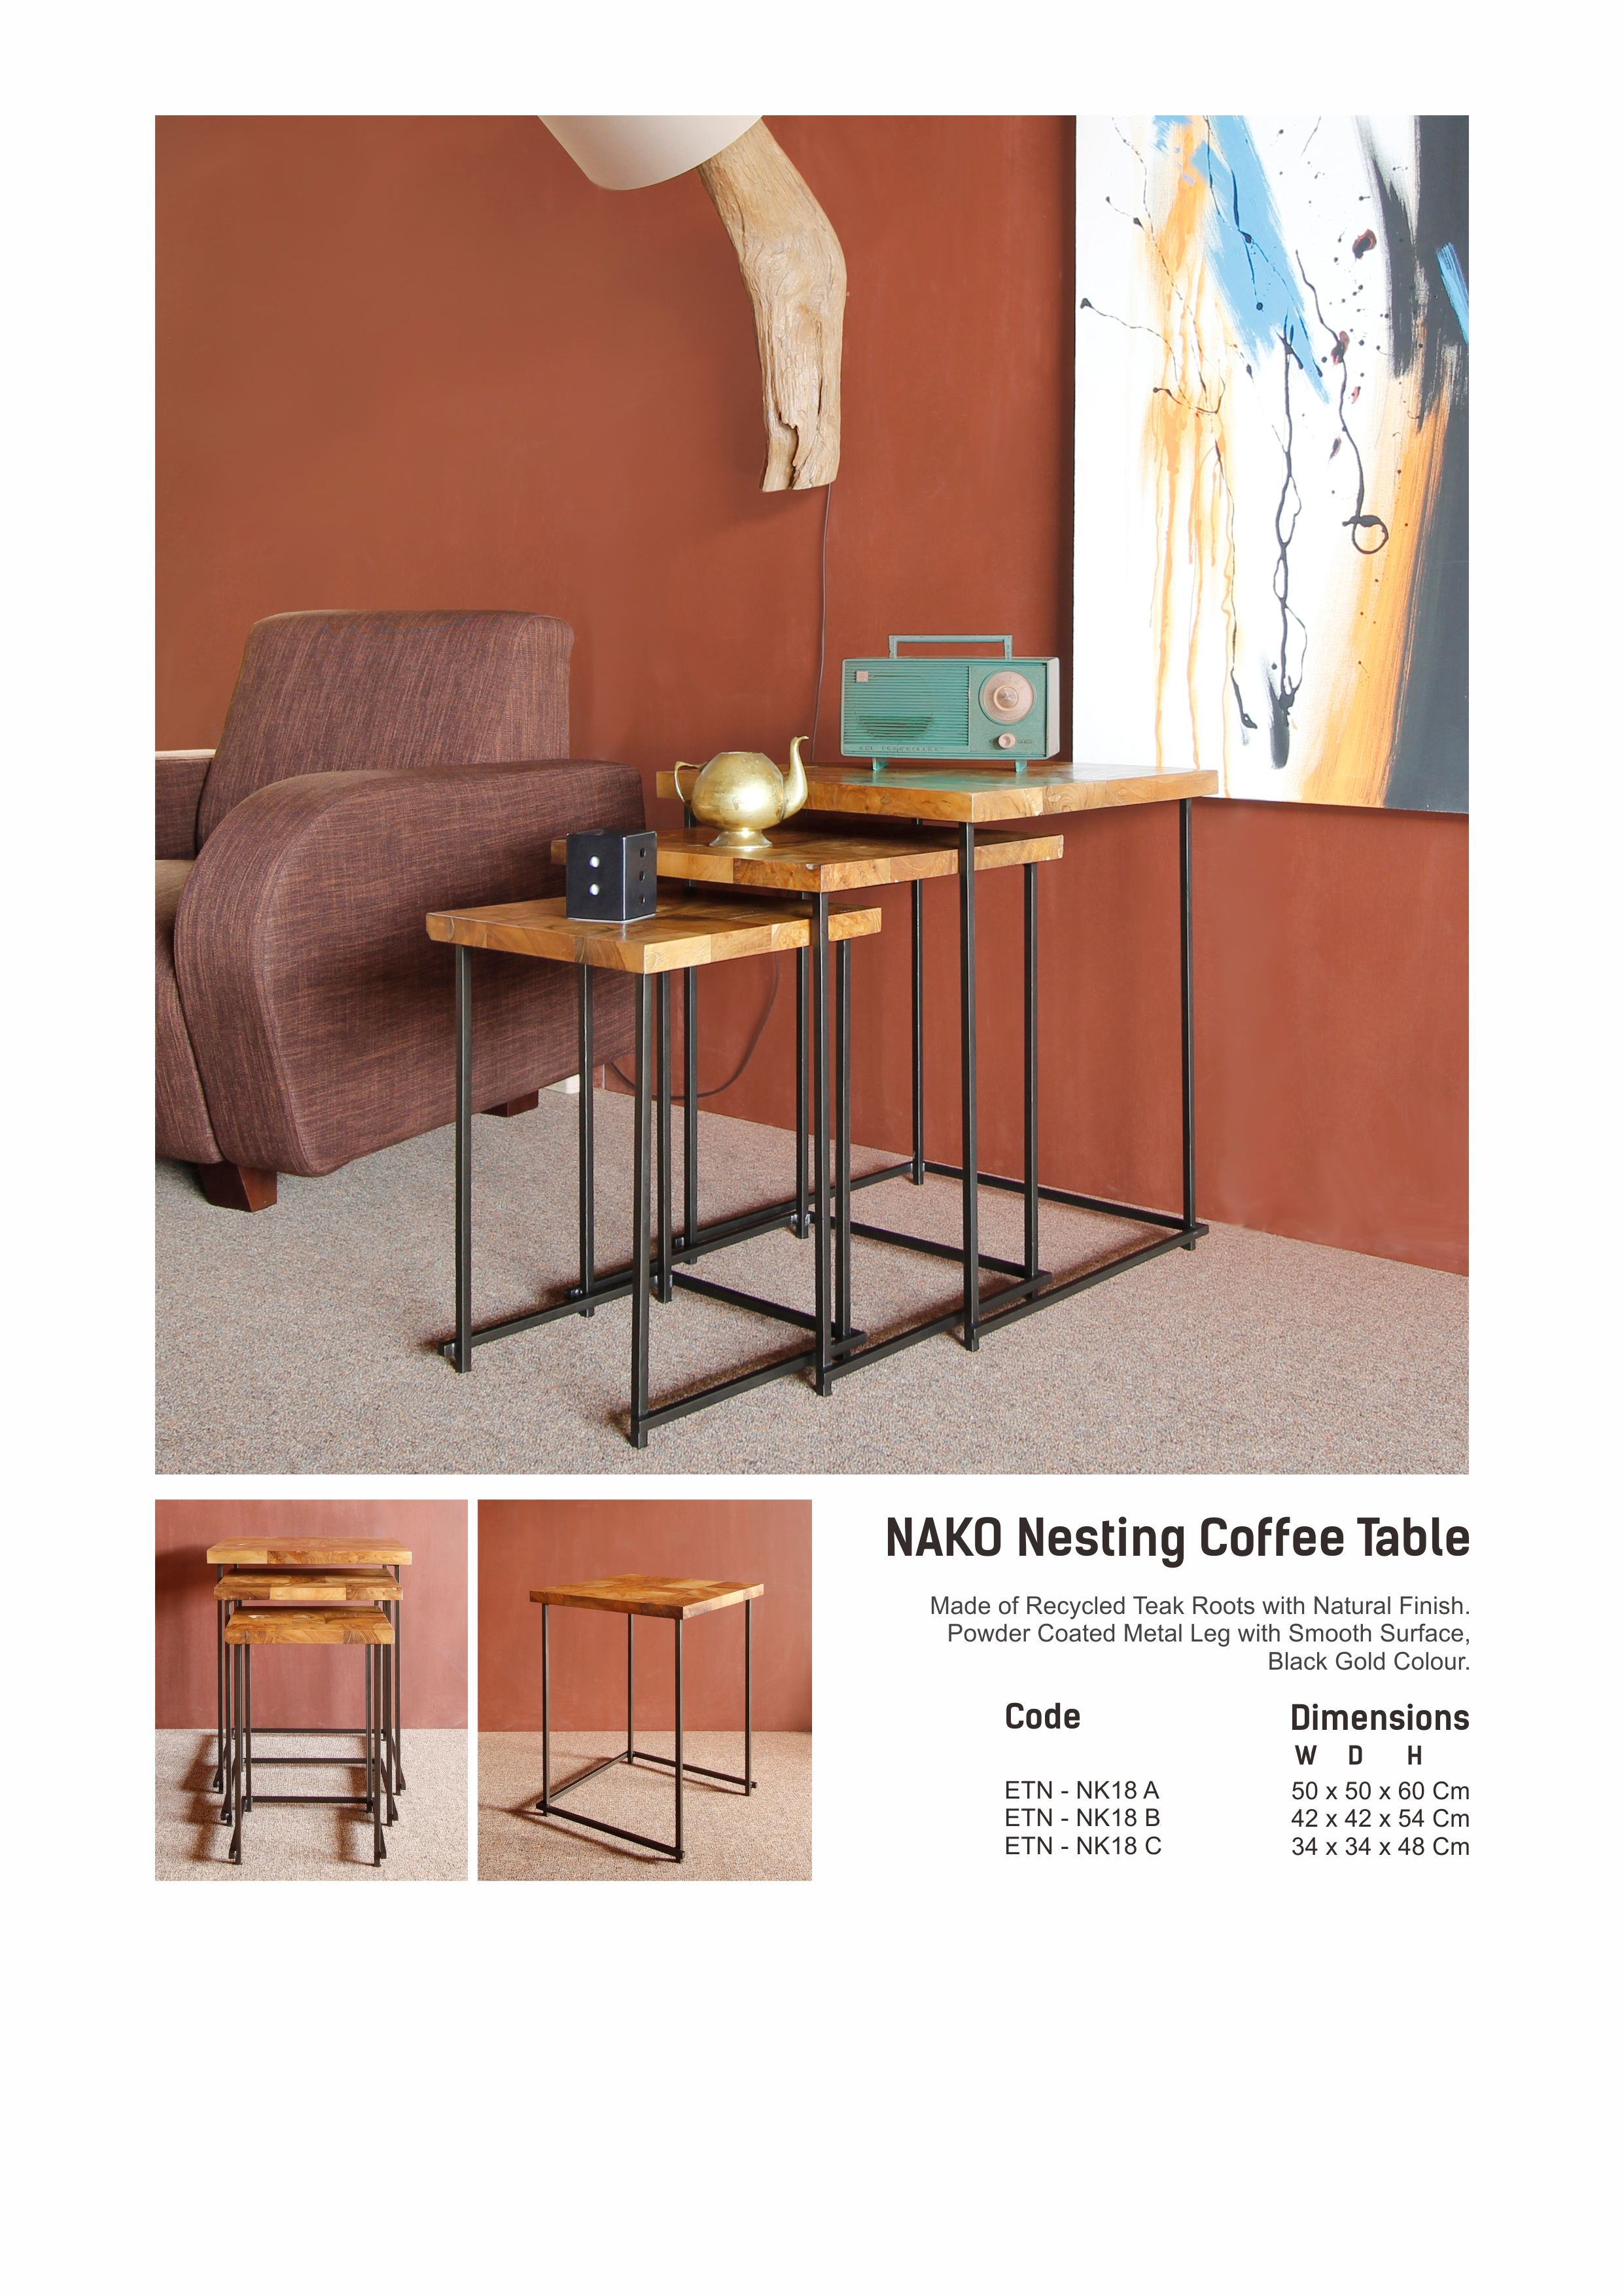 18. NAKO Nesting Table